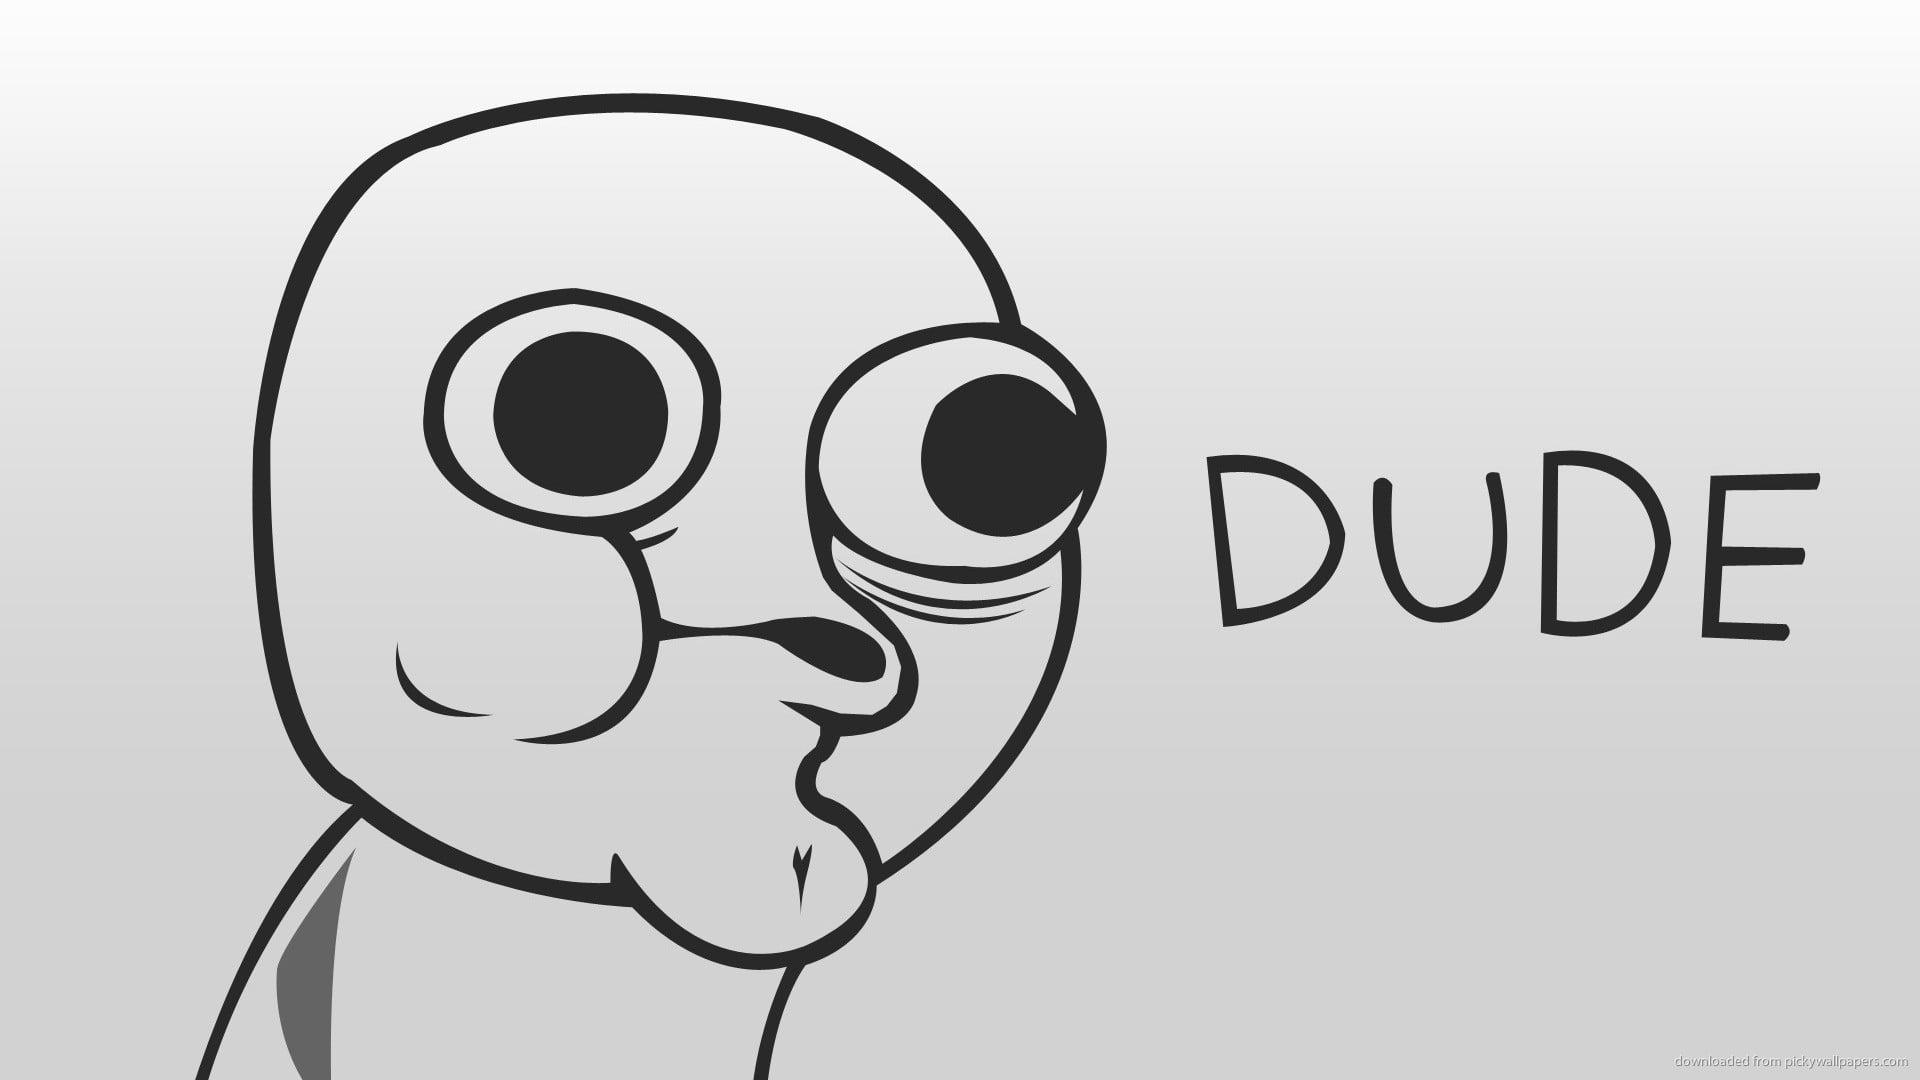 Dude Troll Illustration, Dude, Cartoon, Typography - 1600 X 900 Wallpaper Memes , HD Wallpaper & Backgrounds